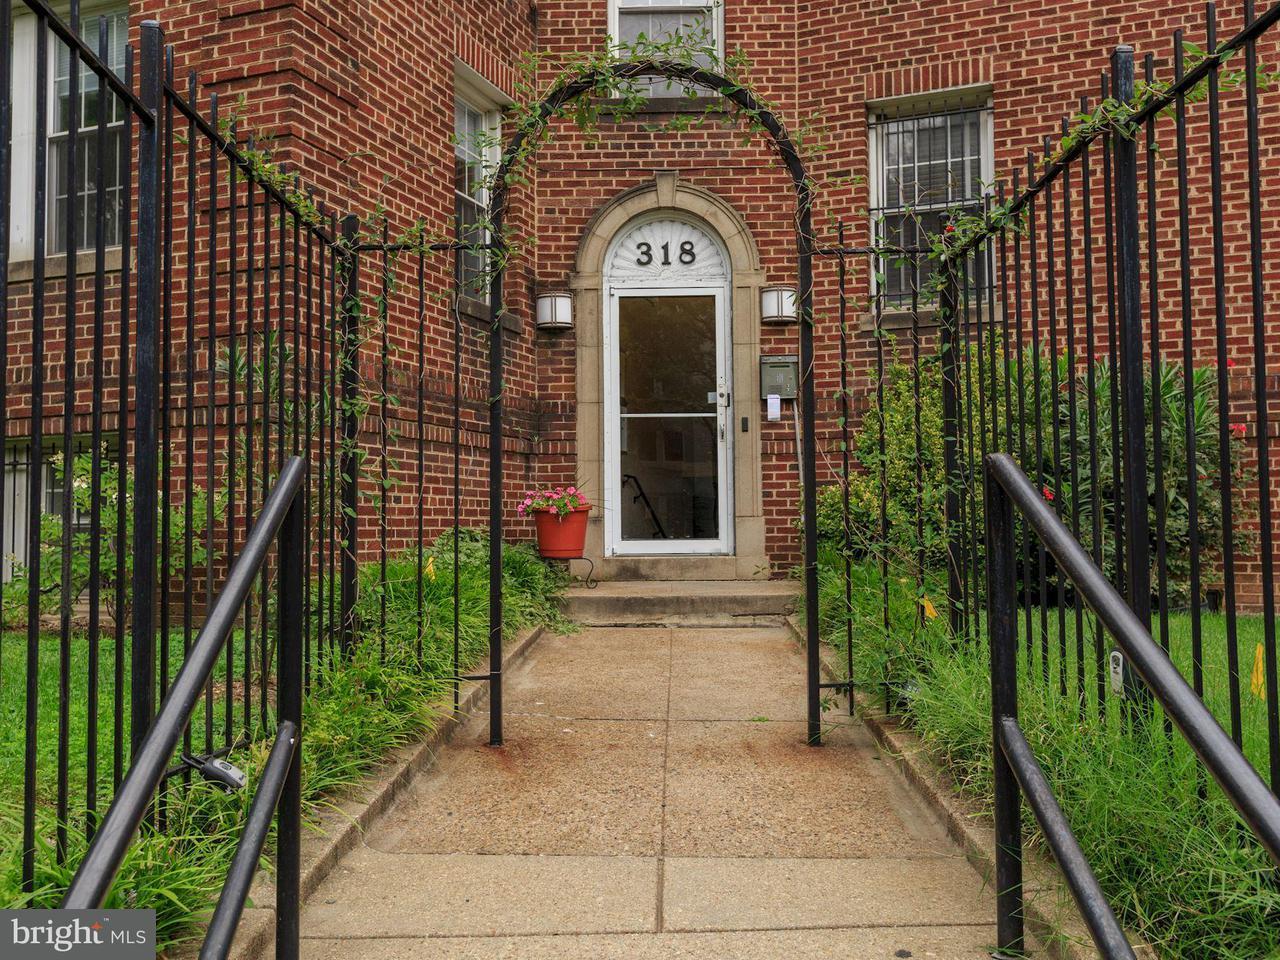 Condominium for Sale at 318 Rhode Island Ave NE #b1 Washington, District Of Columbia 20002 United States